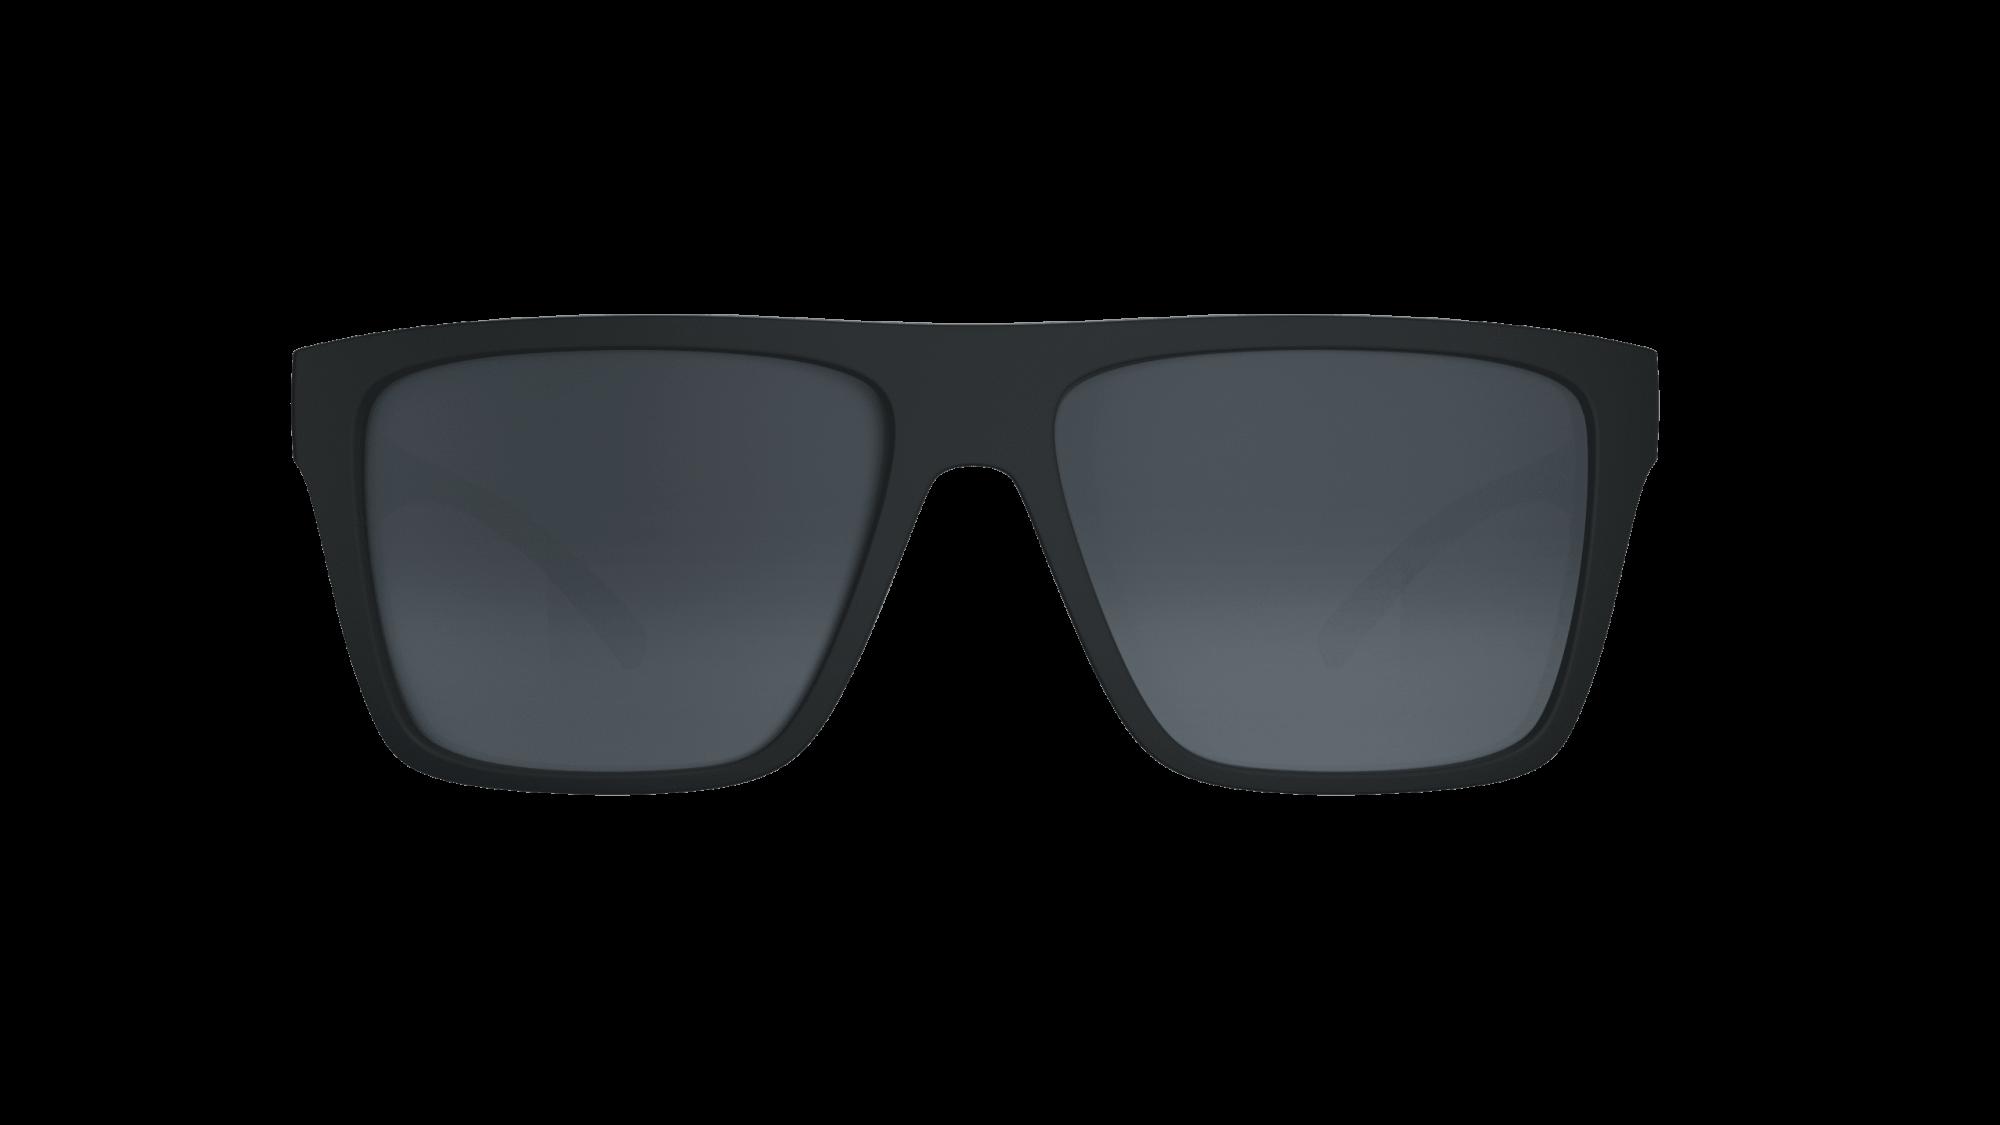 Óculos Floyd HB Matte Black Gray